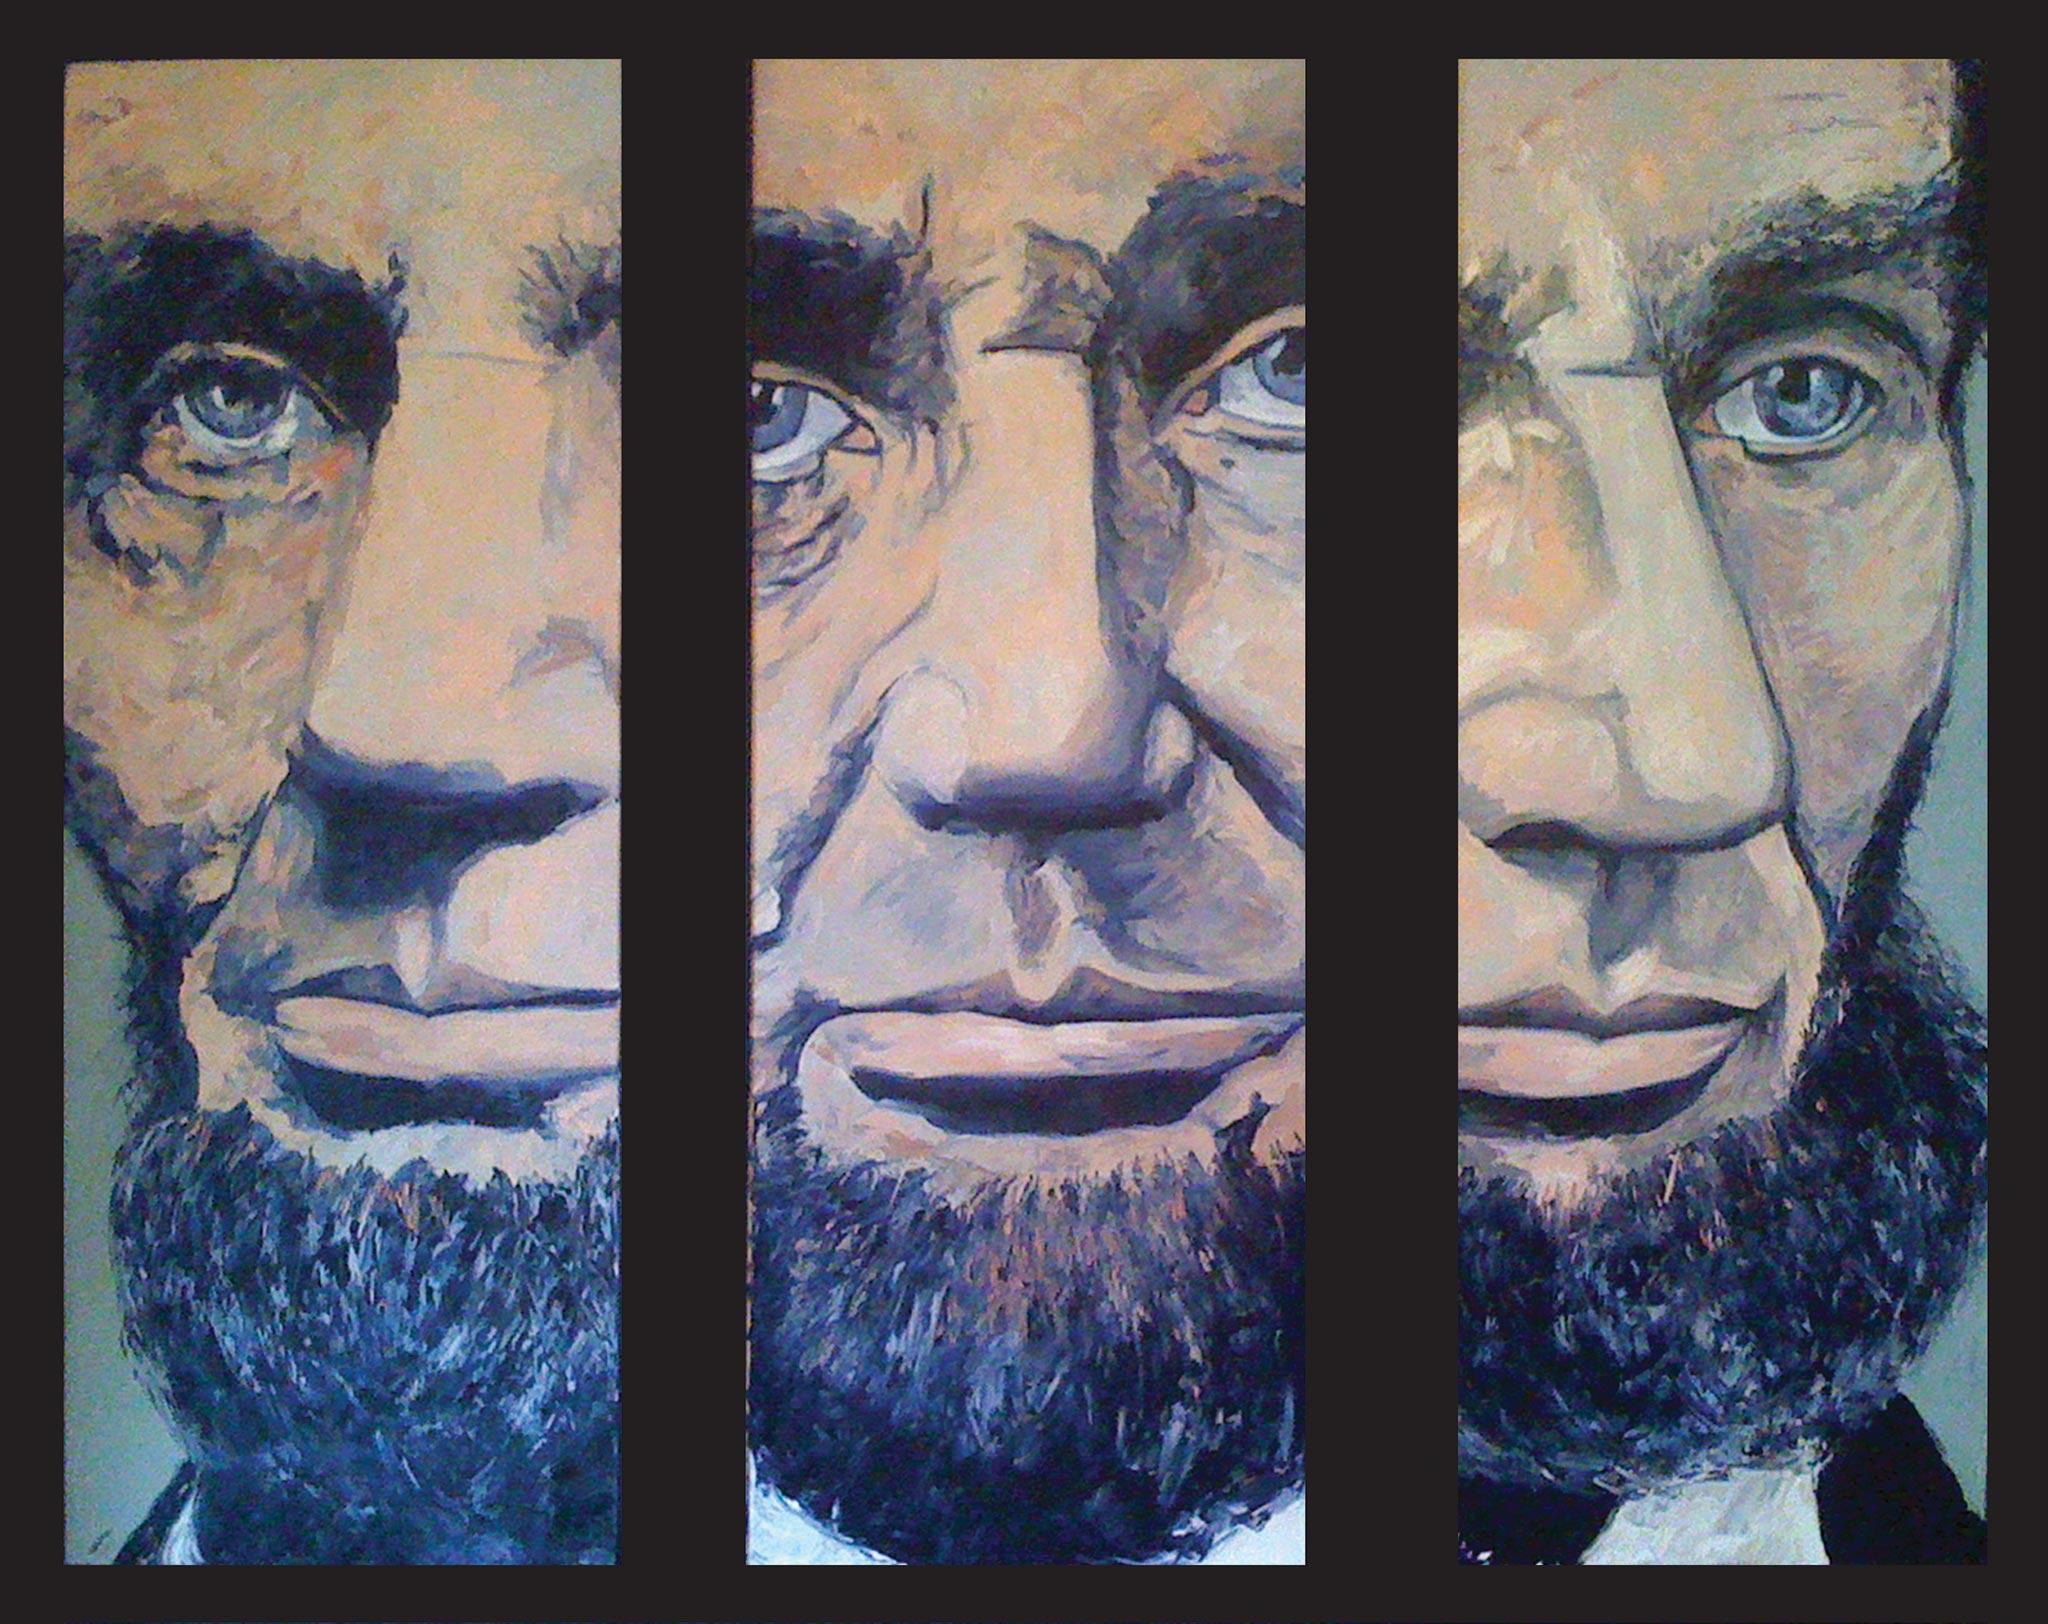 Lincoln 165, Wendy Allen, Oil on Canvas